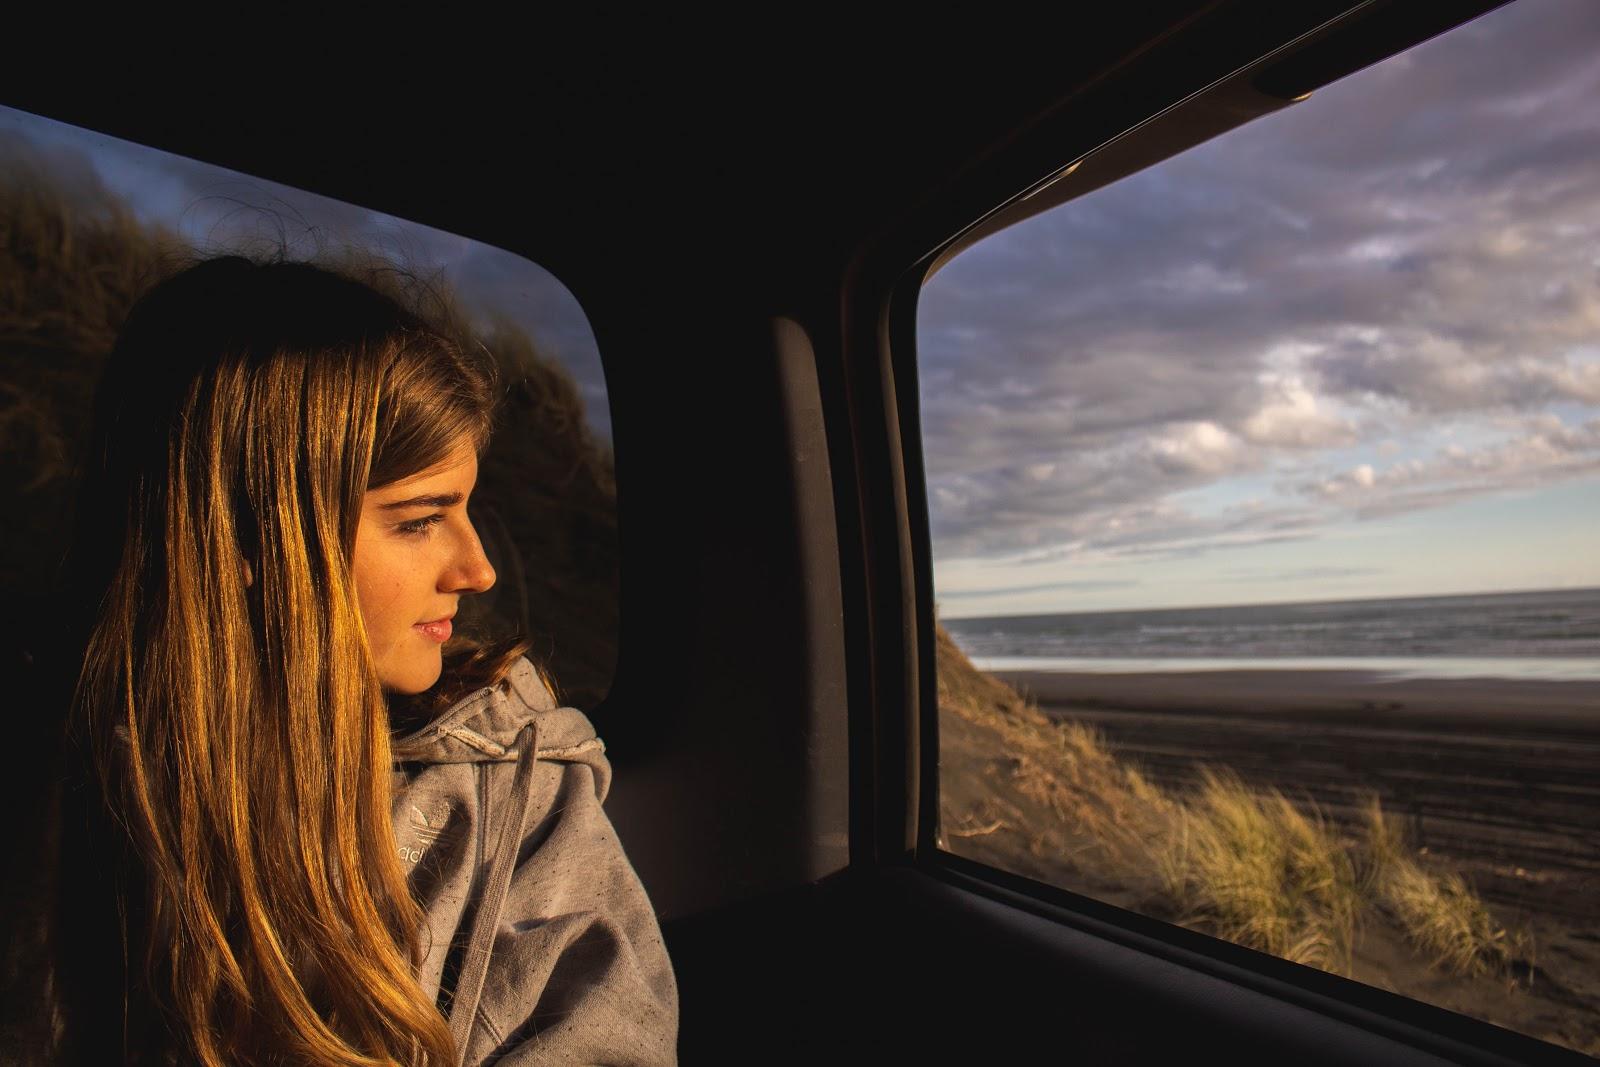 Hygge: The Danish Art of Living Simply